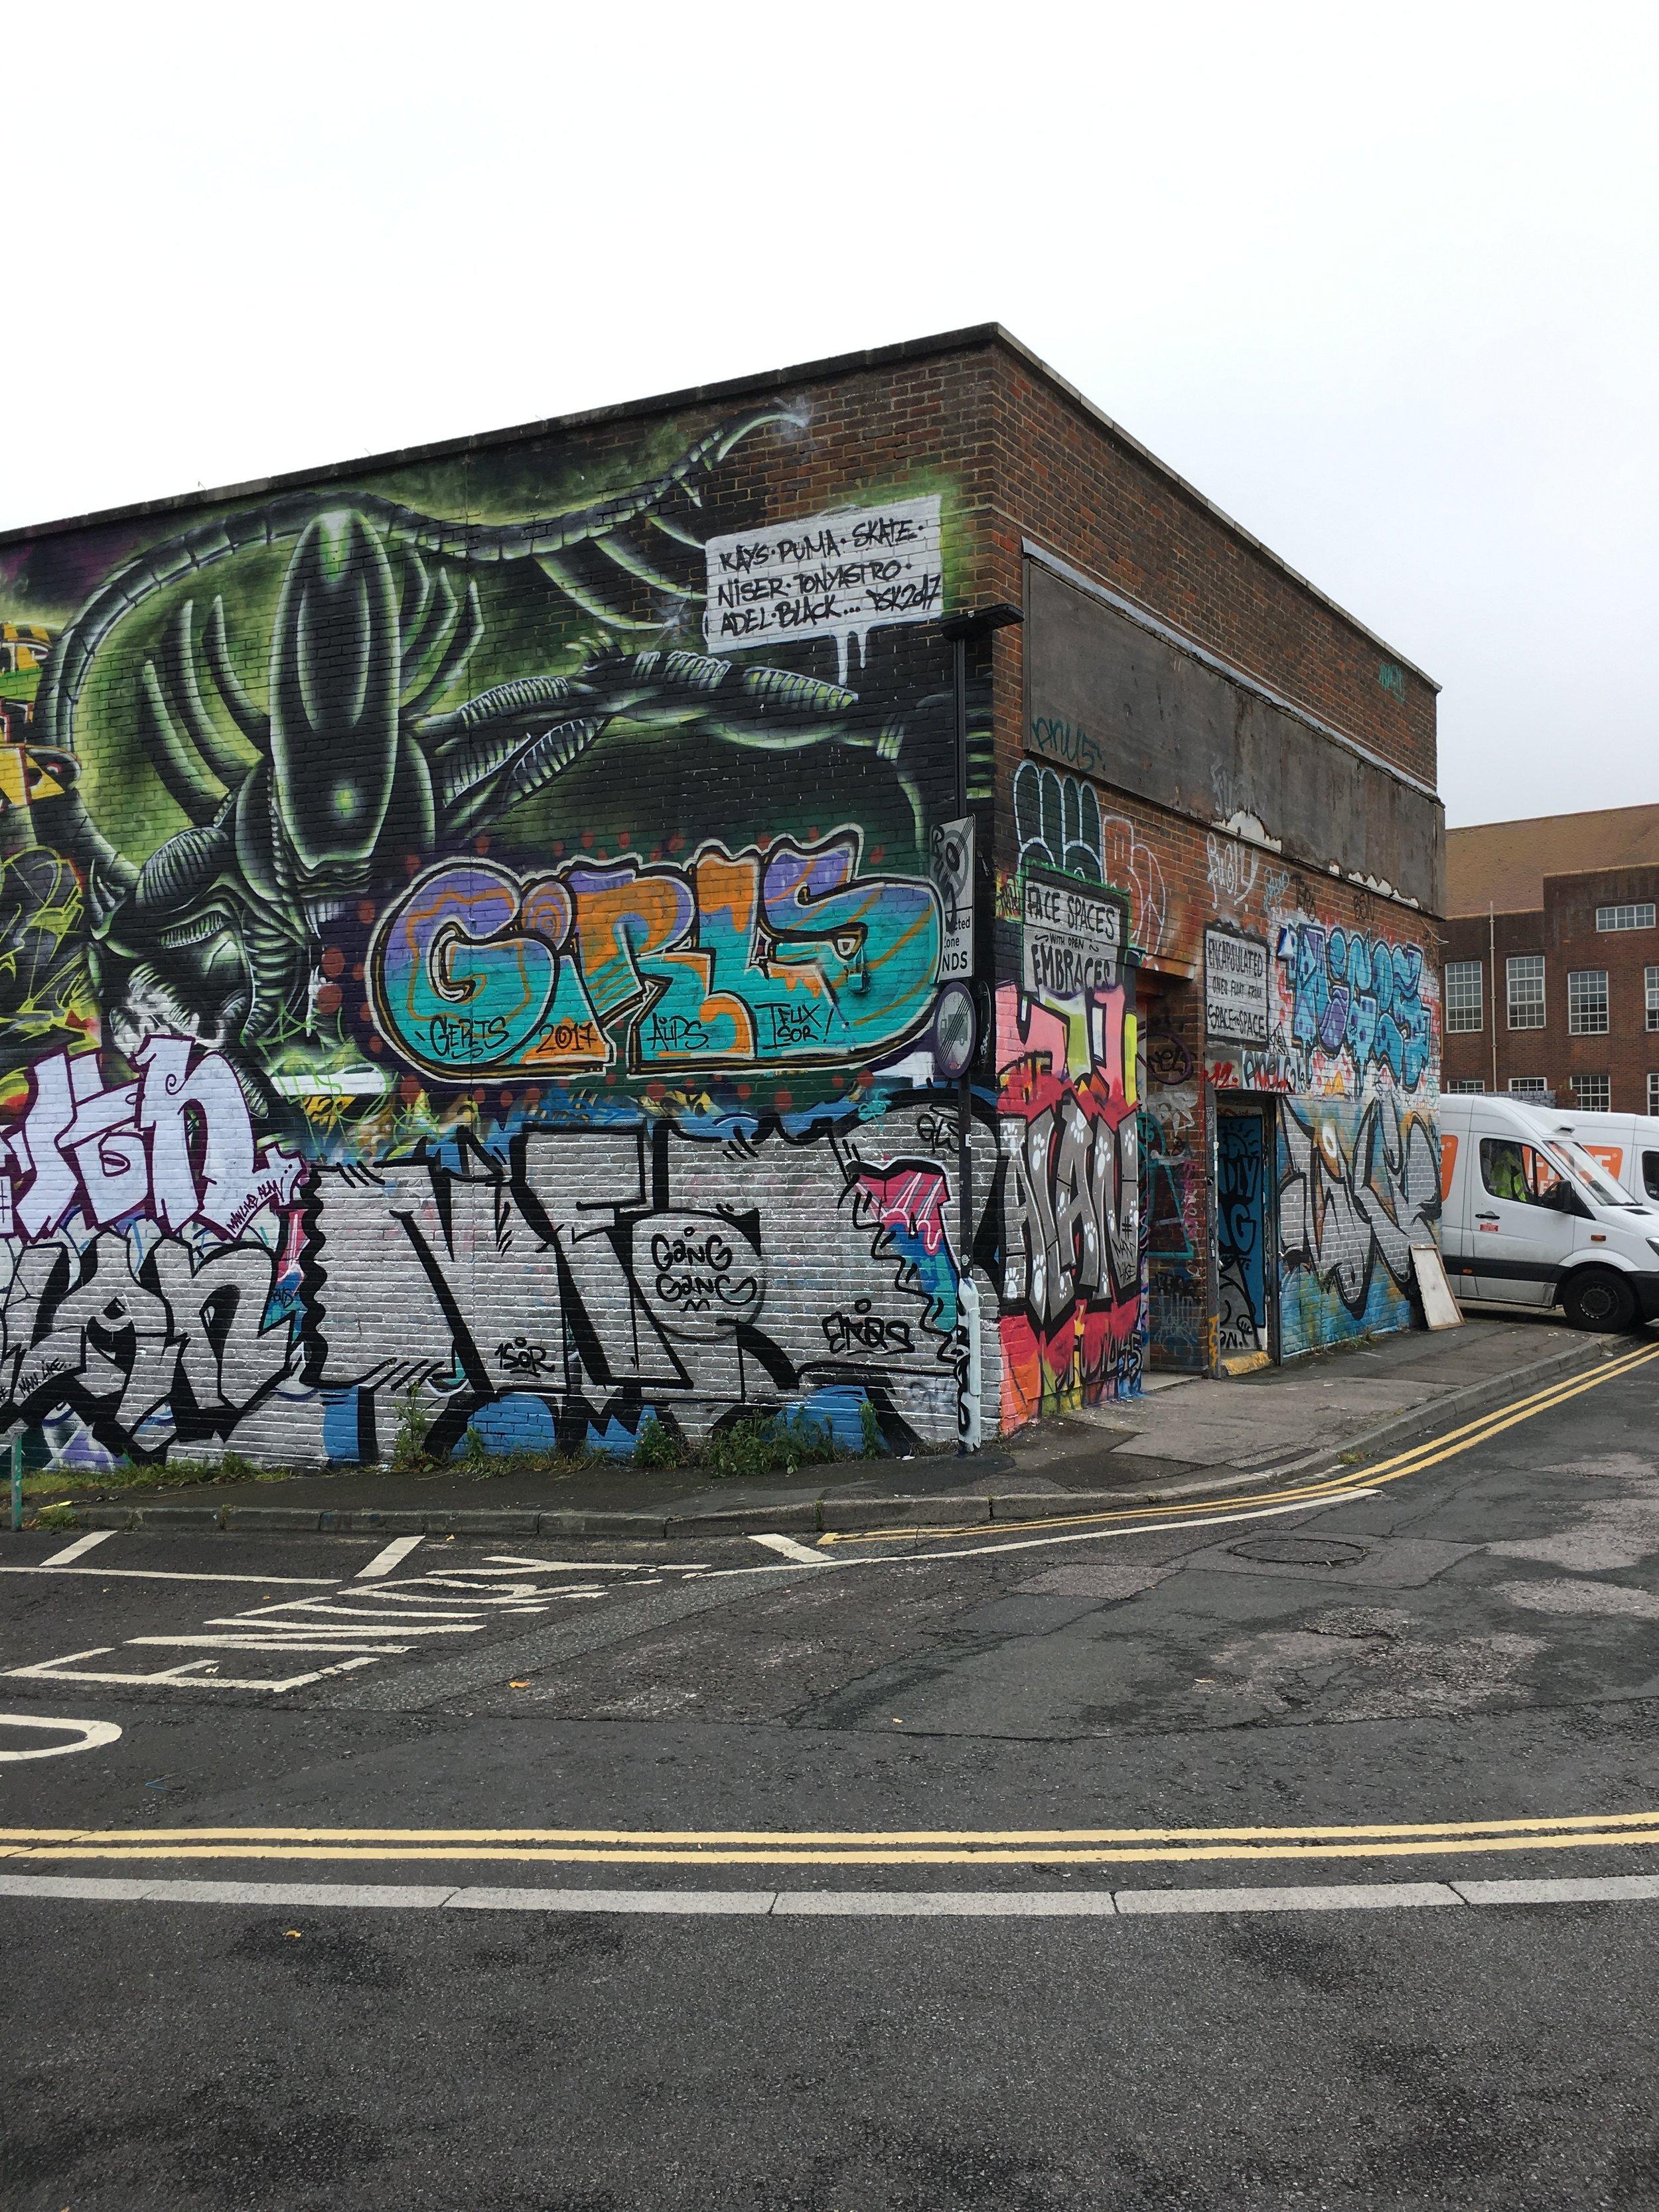 graffiti-art-brighton.JPG